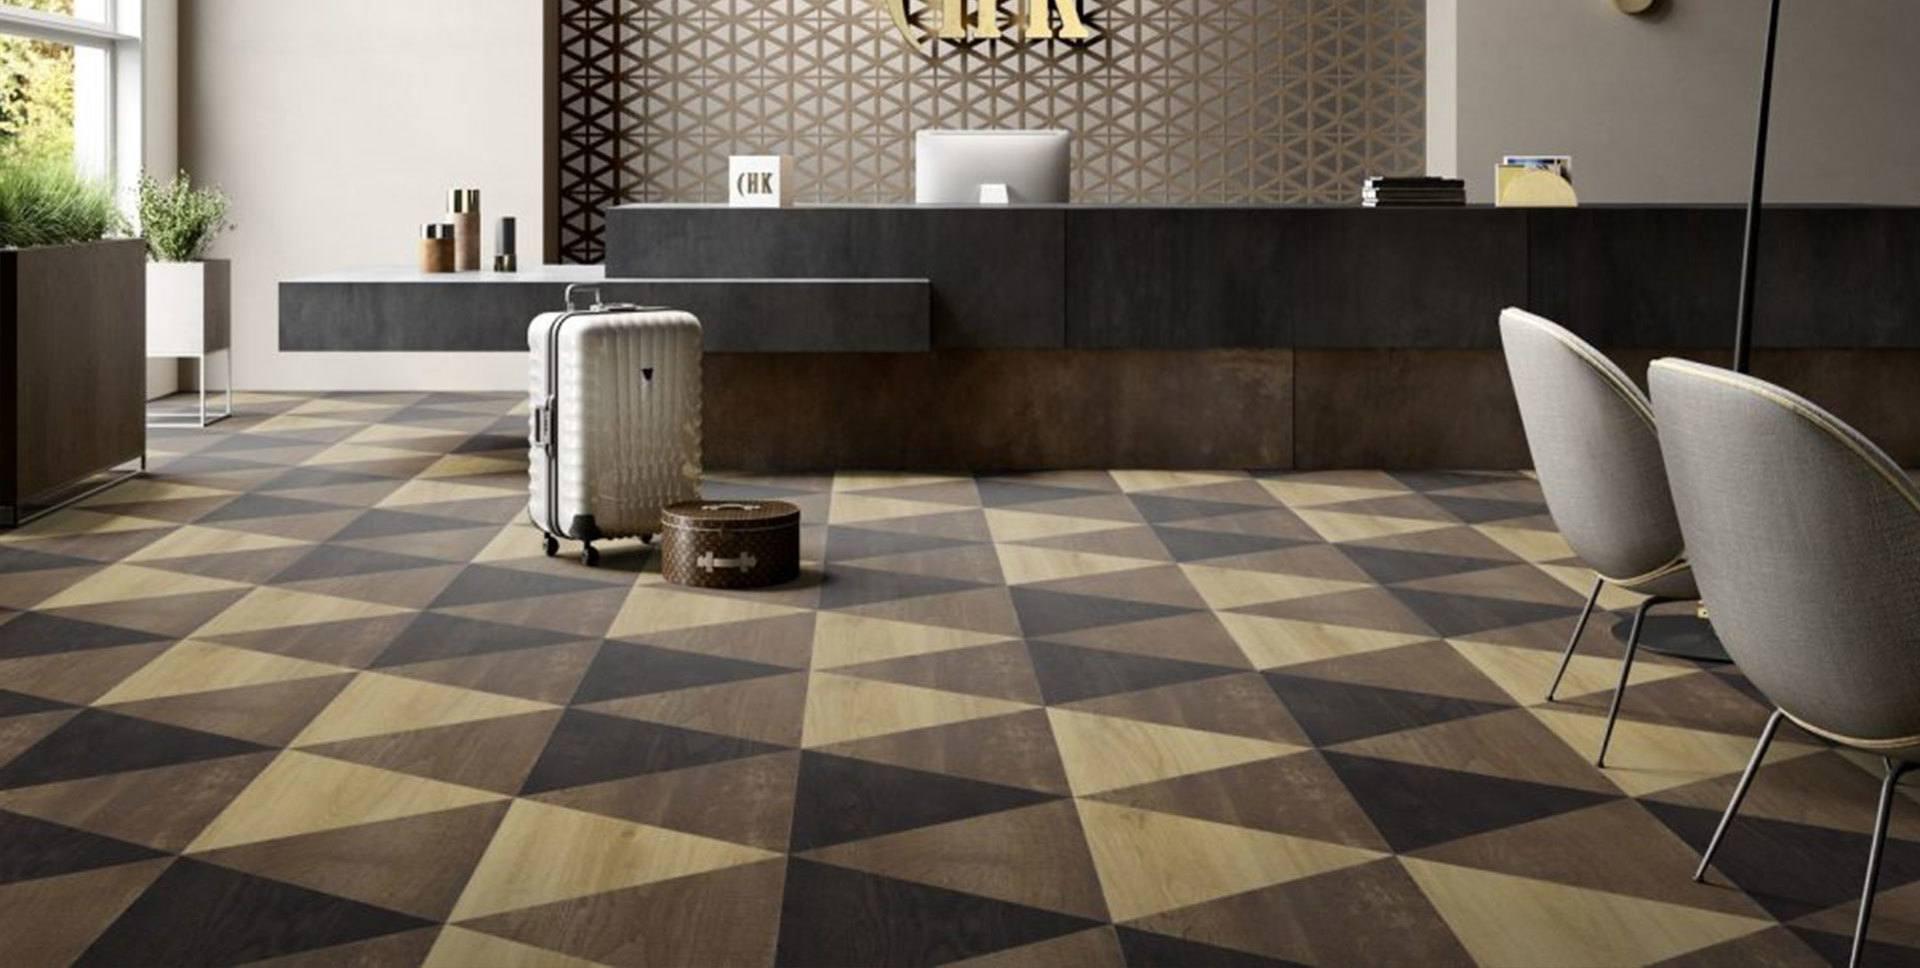 кварц-виниловая плитка в холле